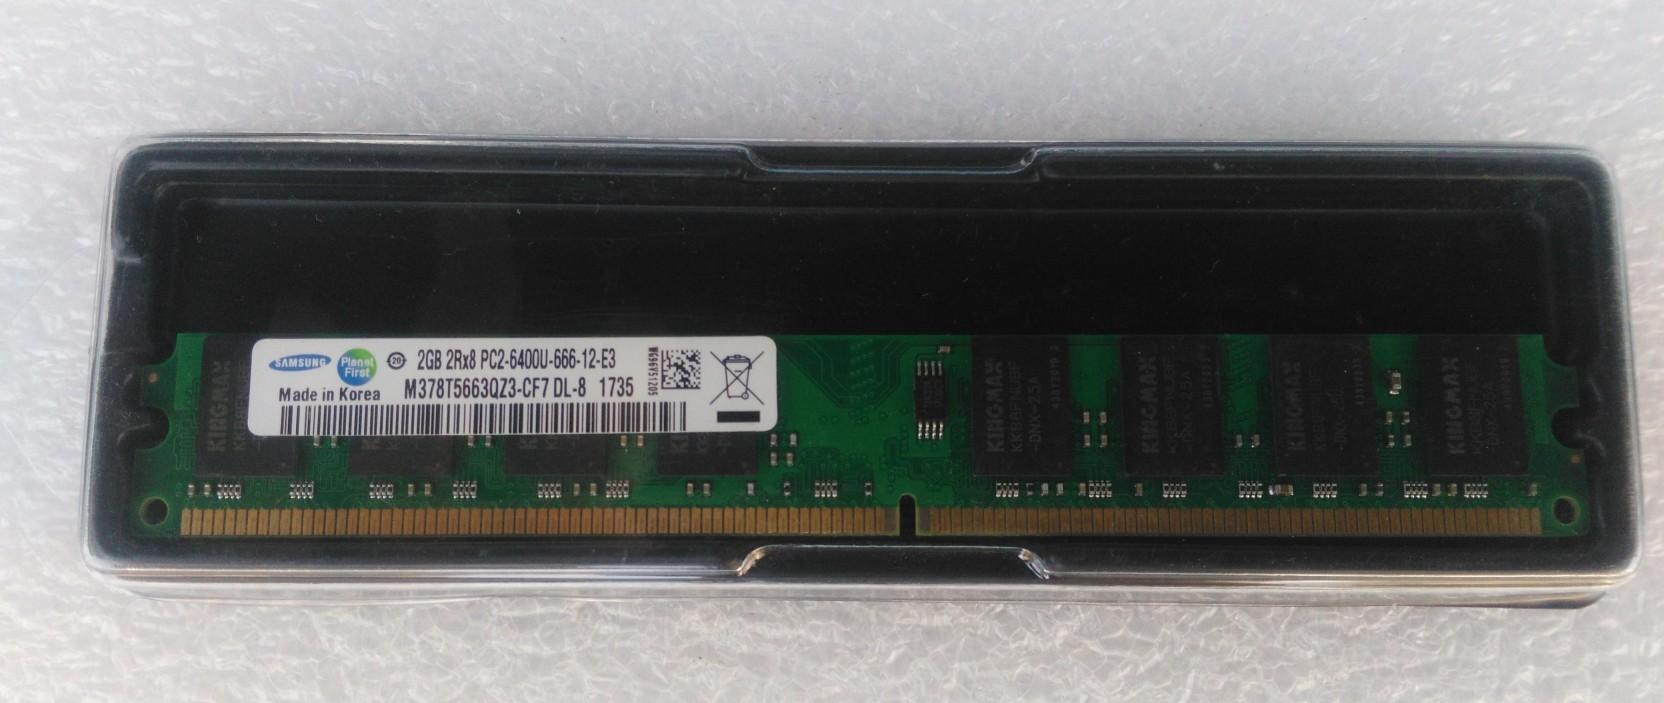 Samsung Original Ddr2 2 Gb Single Channel Pc 2gb Desktop Ram Memori Kingston Pc2 6400 Add To Cart